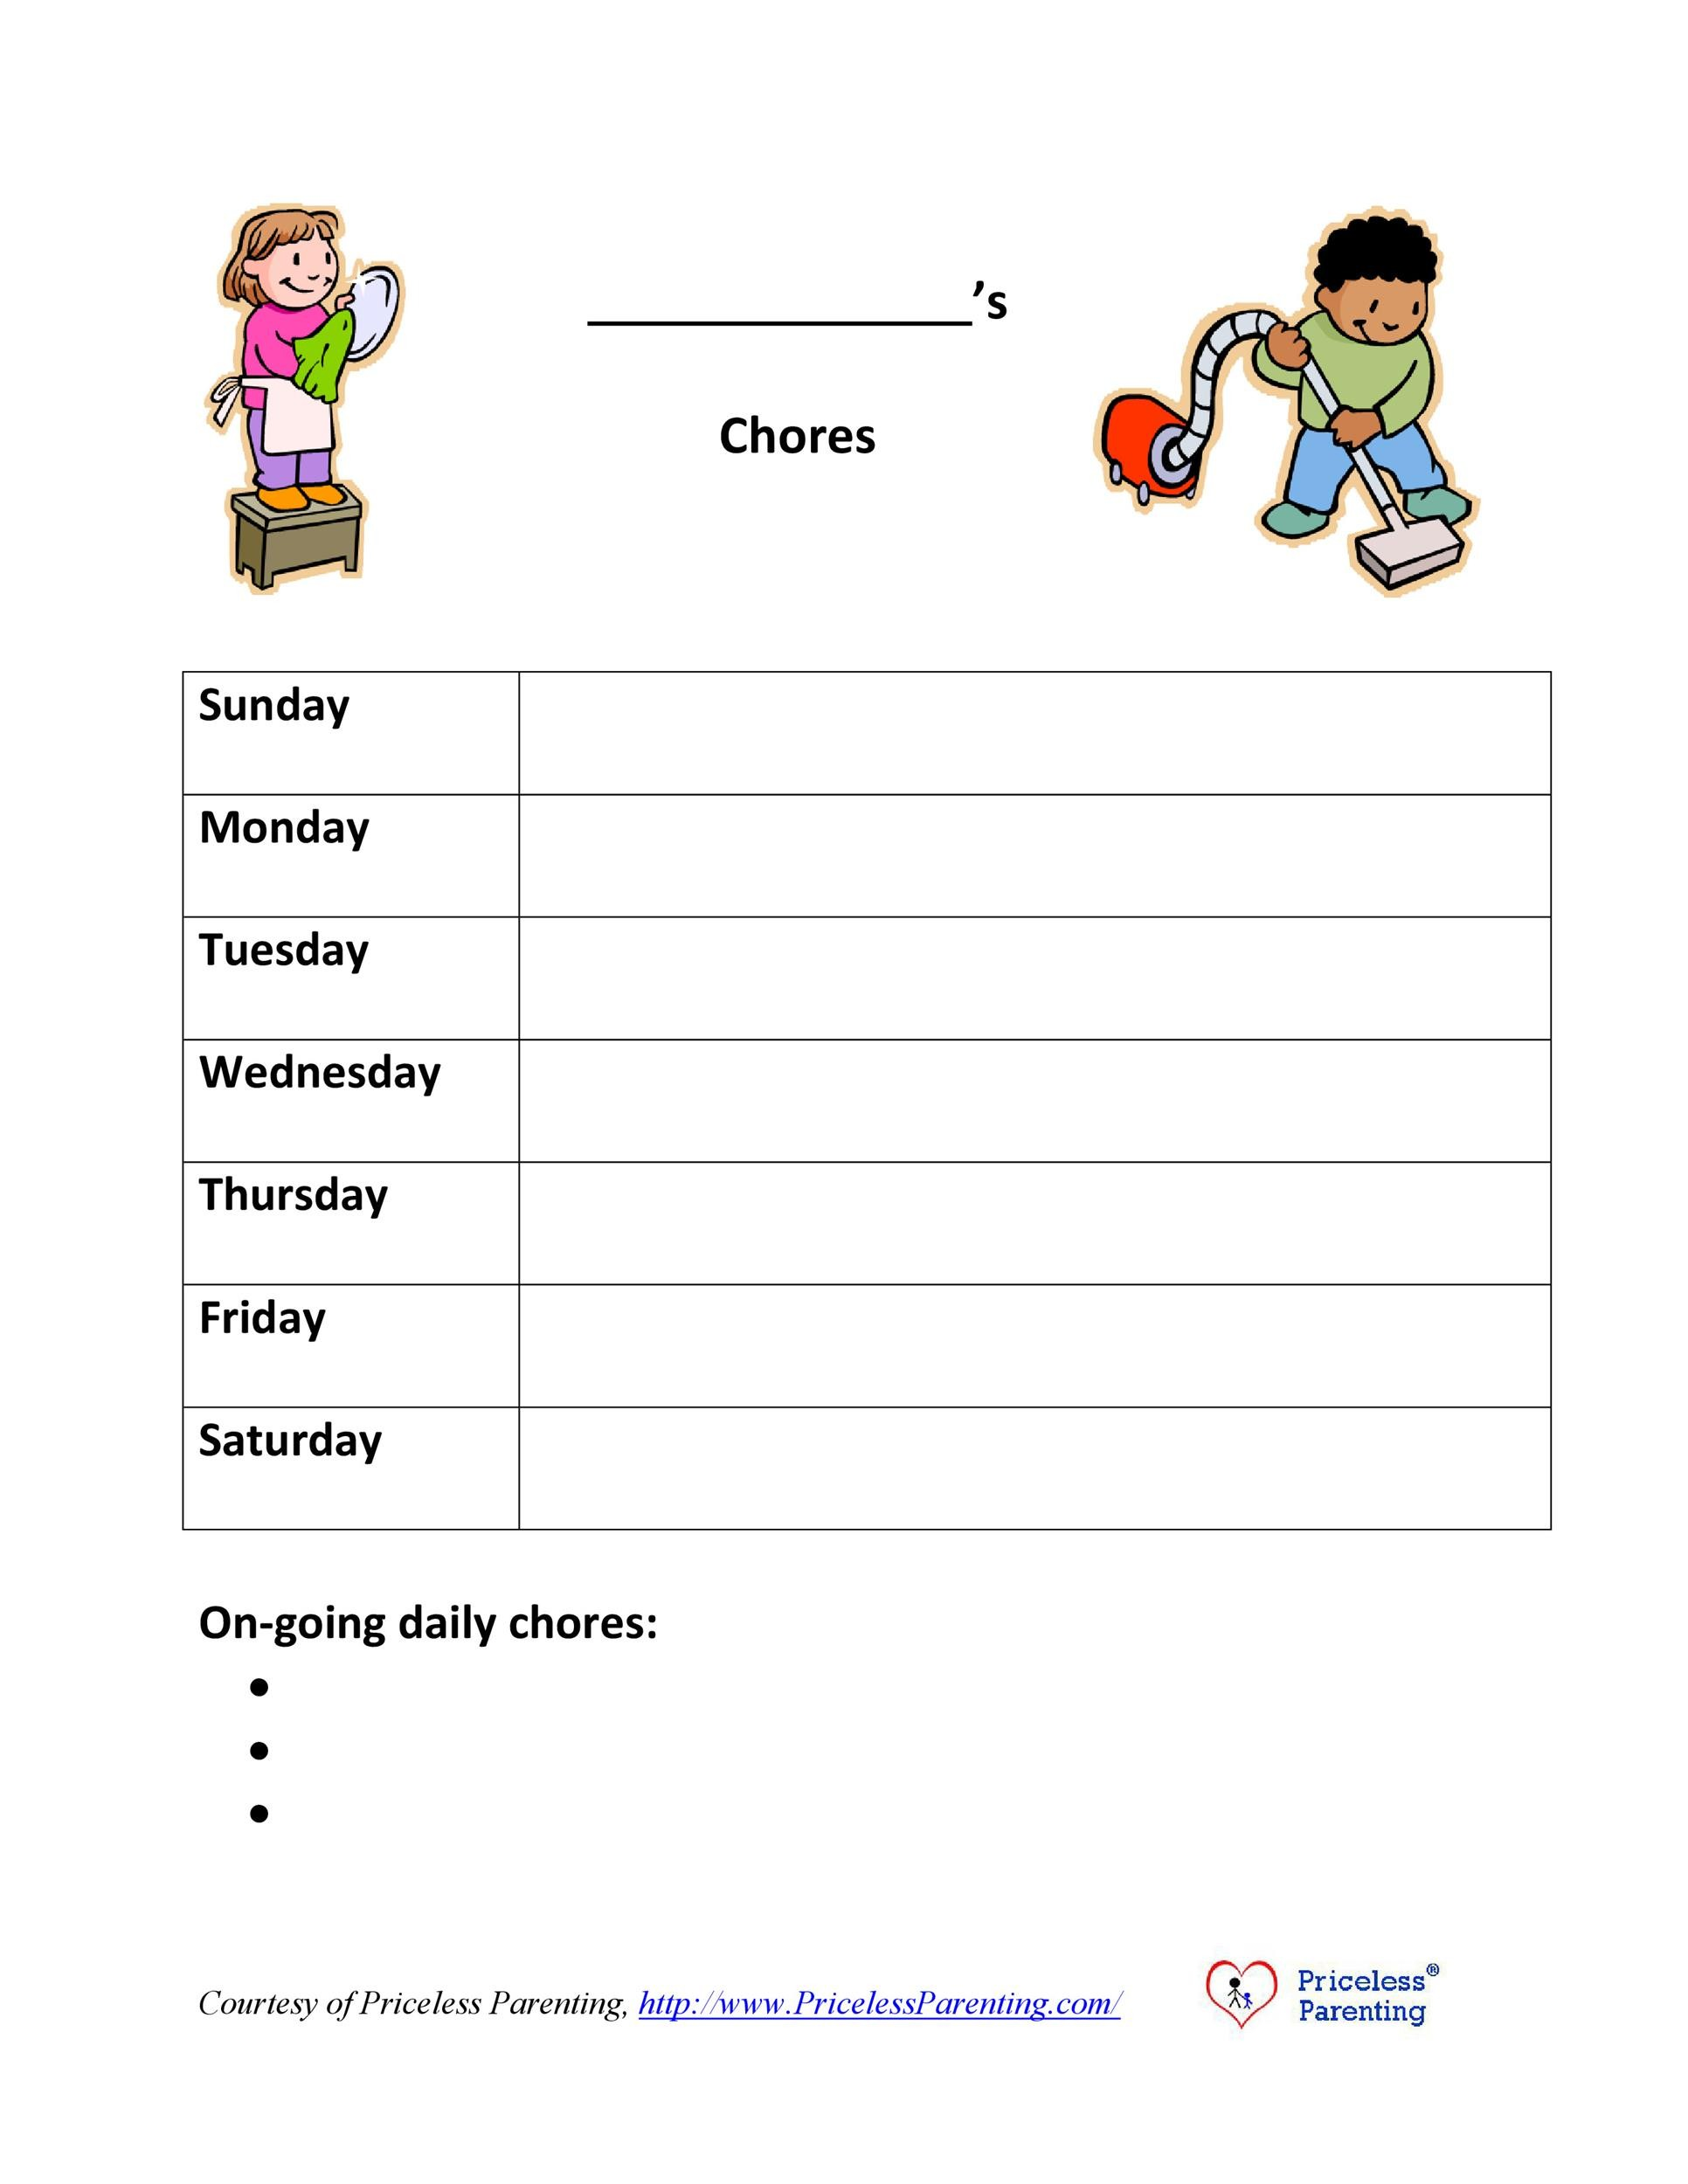 Free chore chart template 21